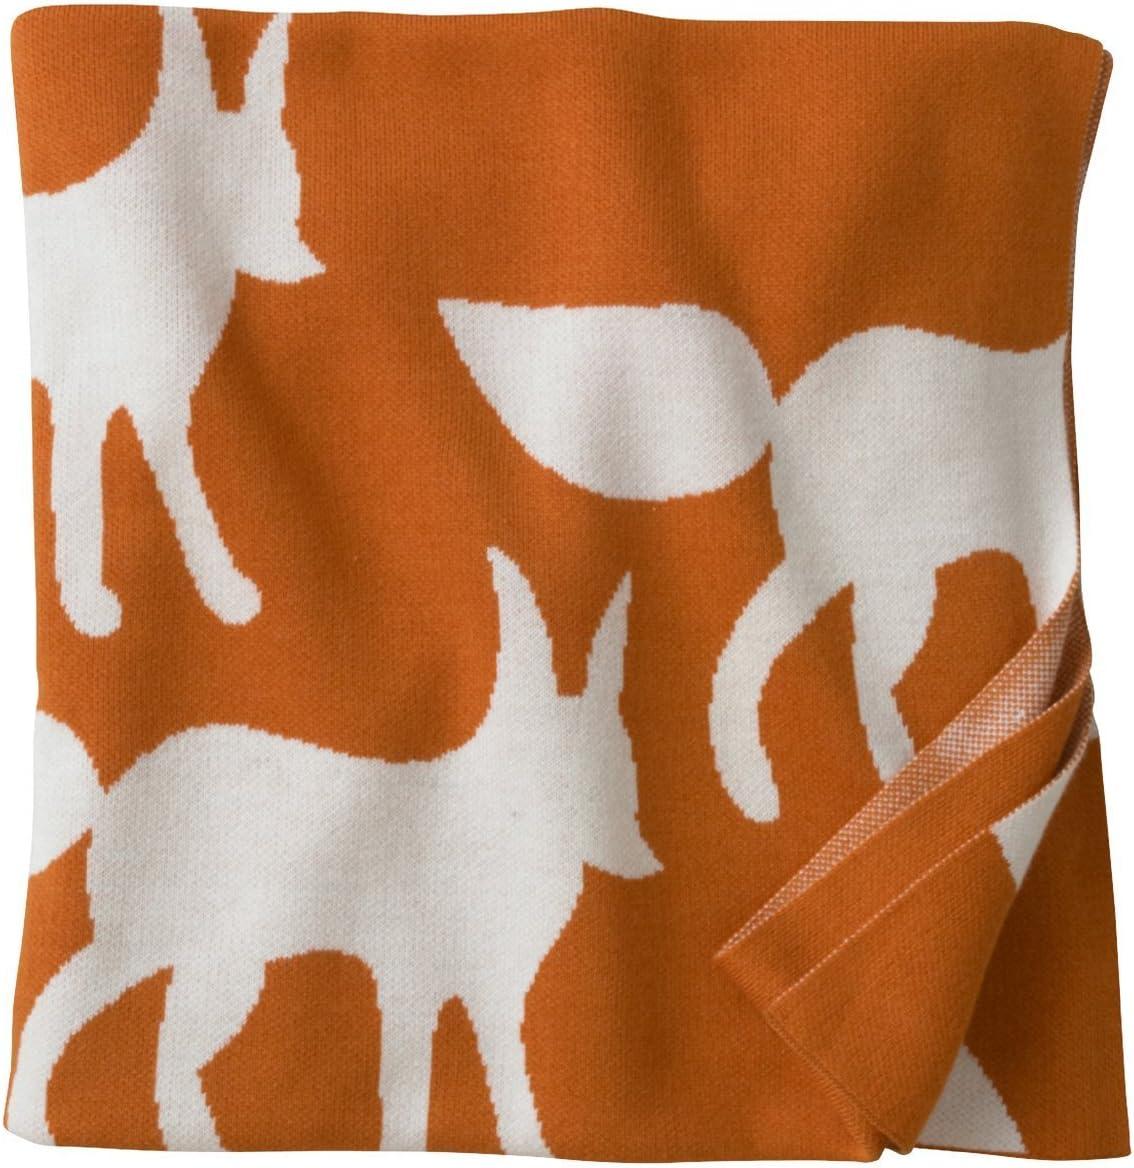 Orange Dwell Studio Foxes Graphic Knit Blanket